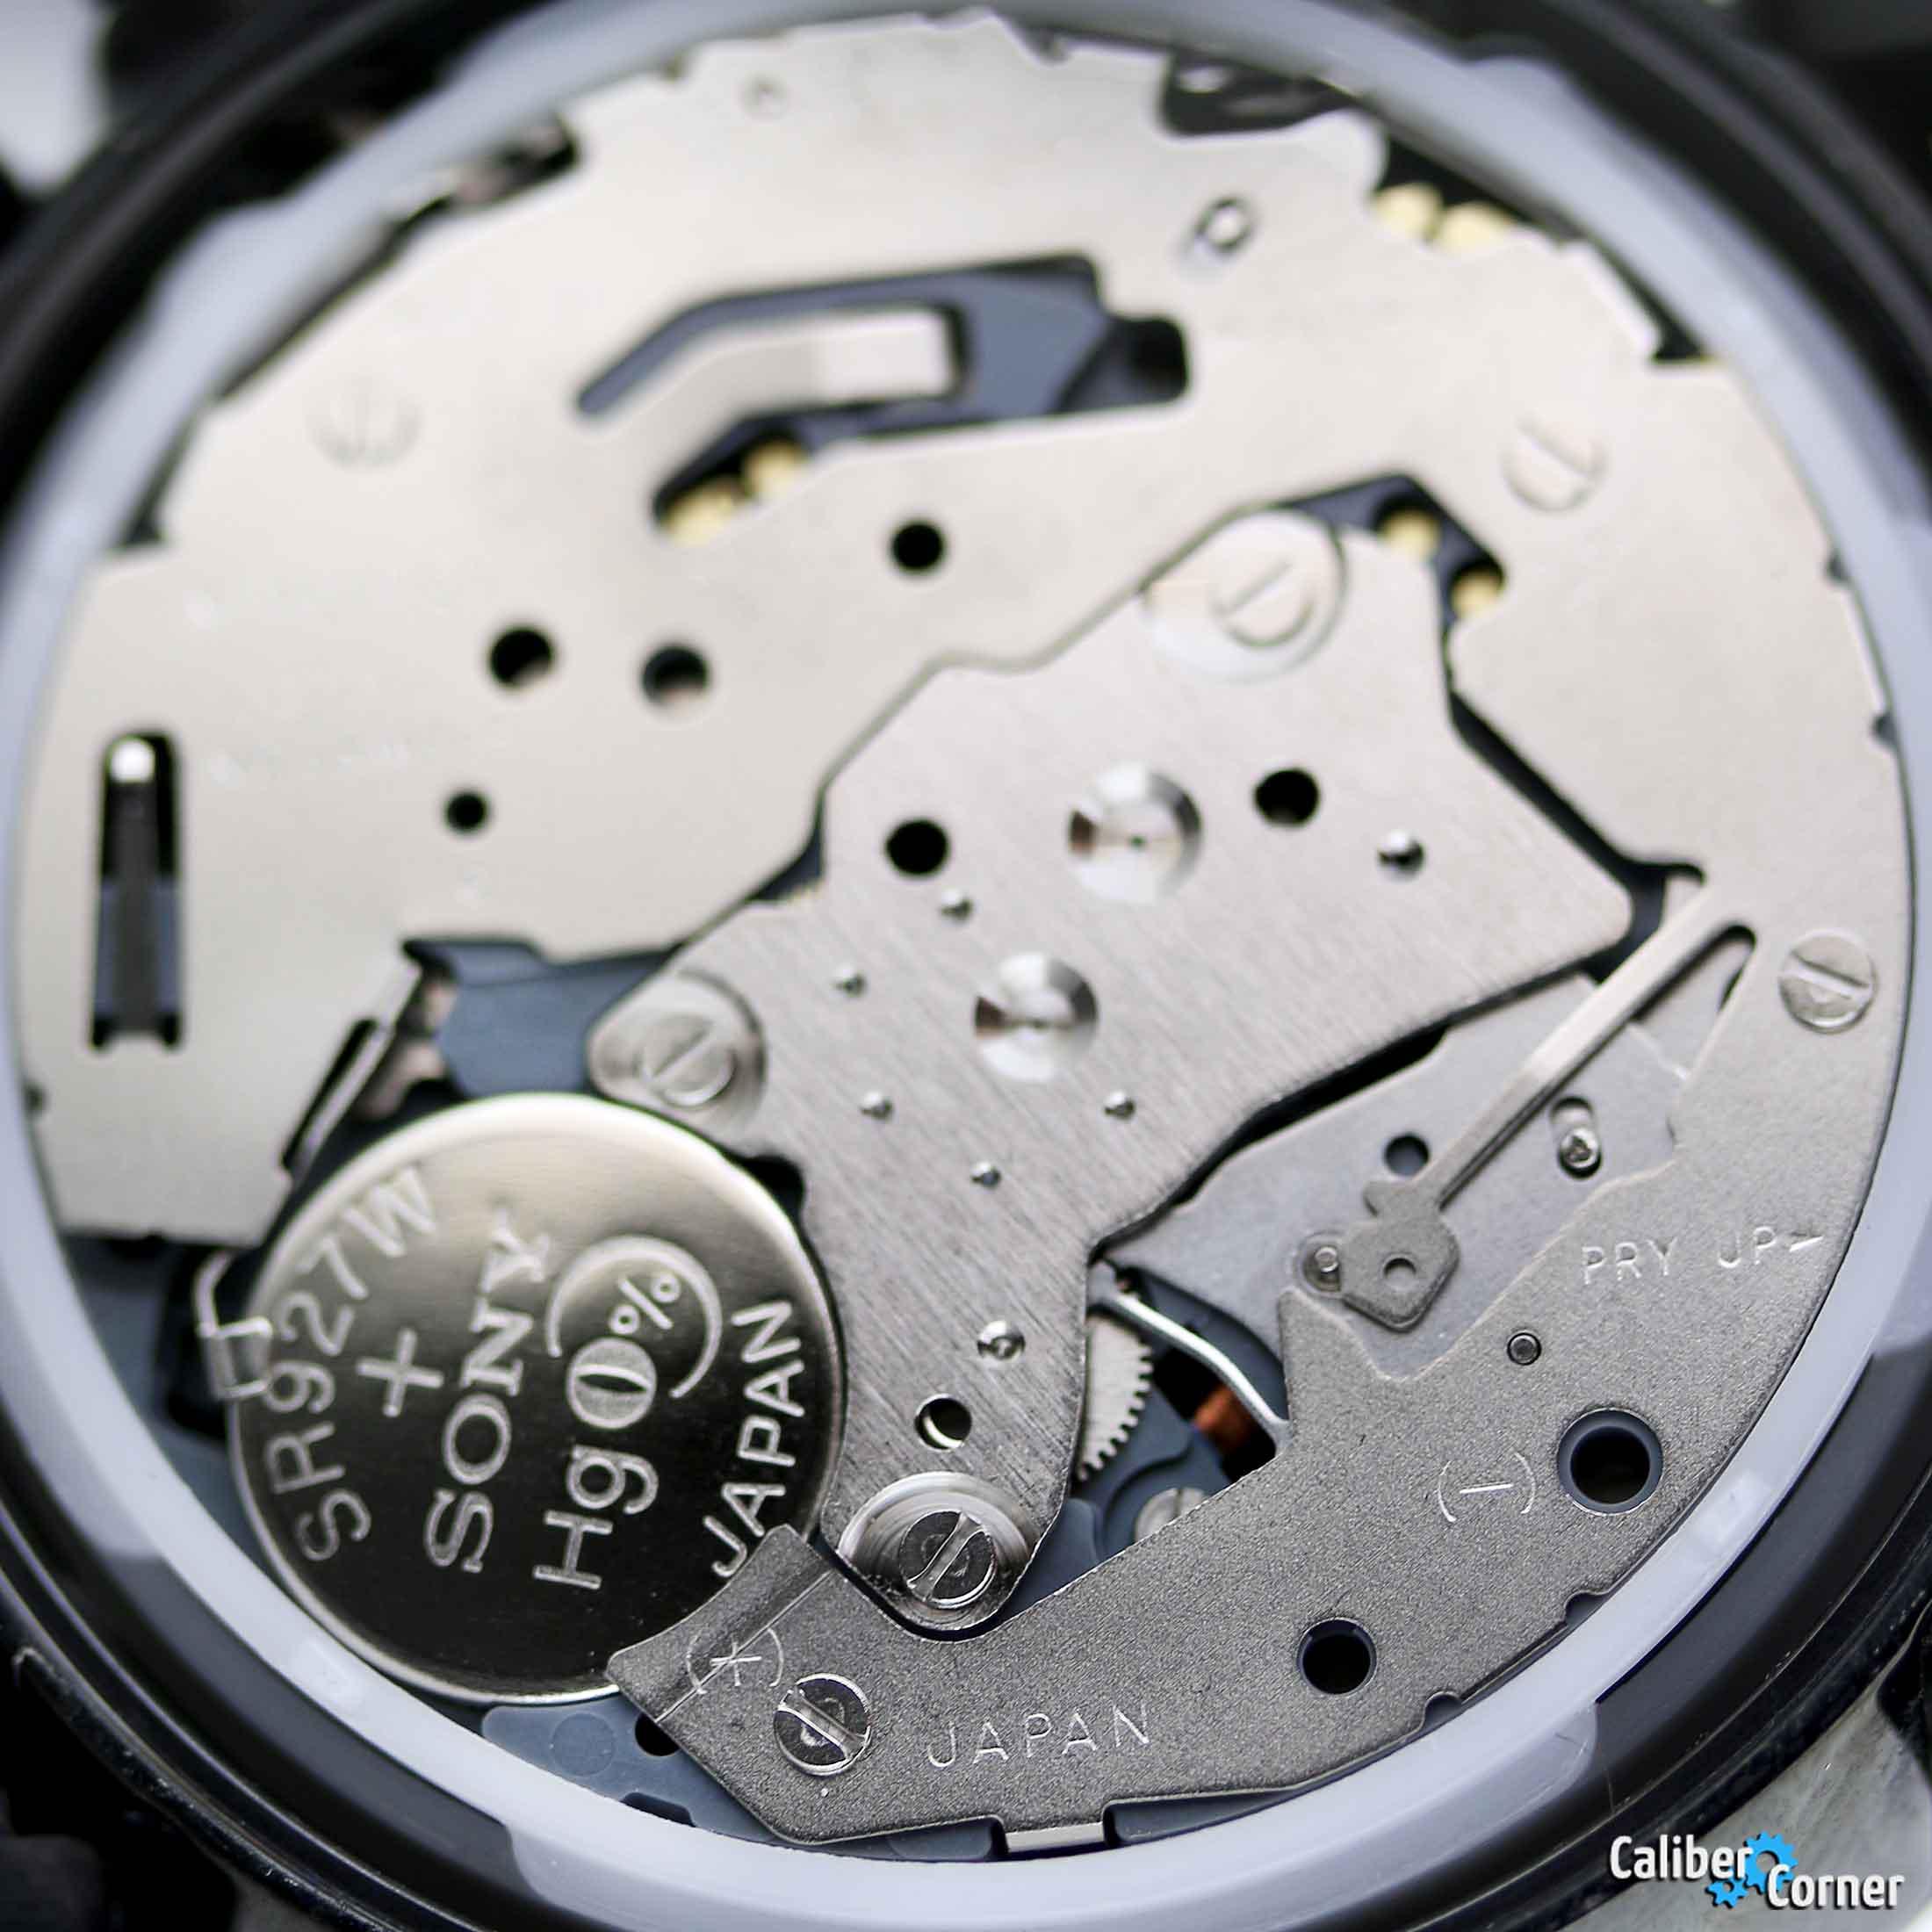 Citizen Miyota Caliber 0S20 aka OS20 quartz chronograph movement